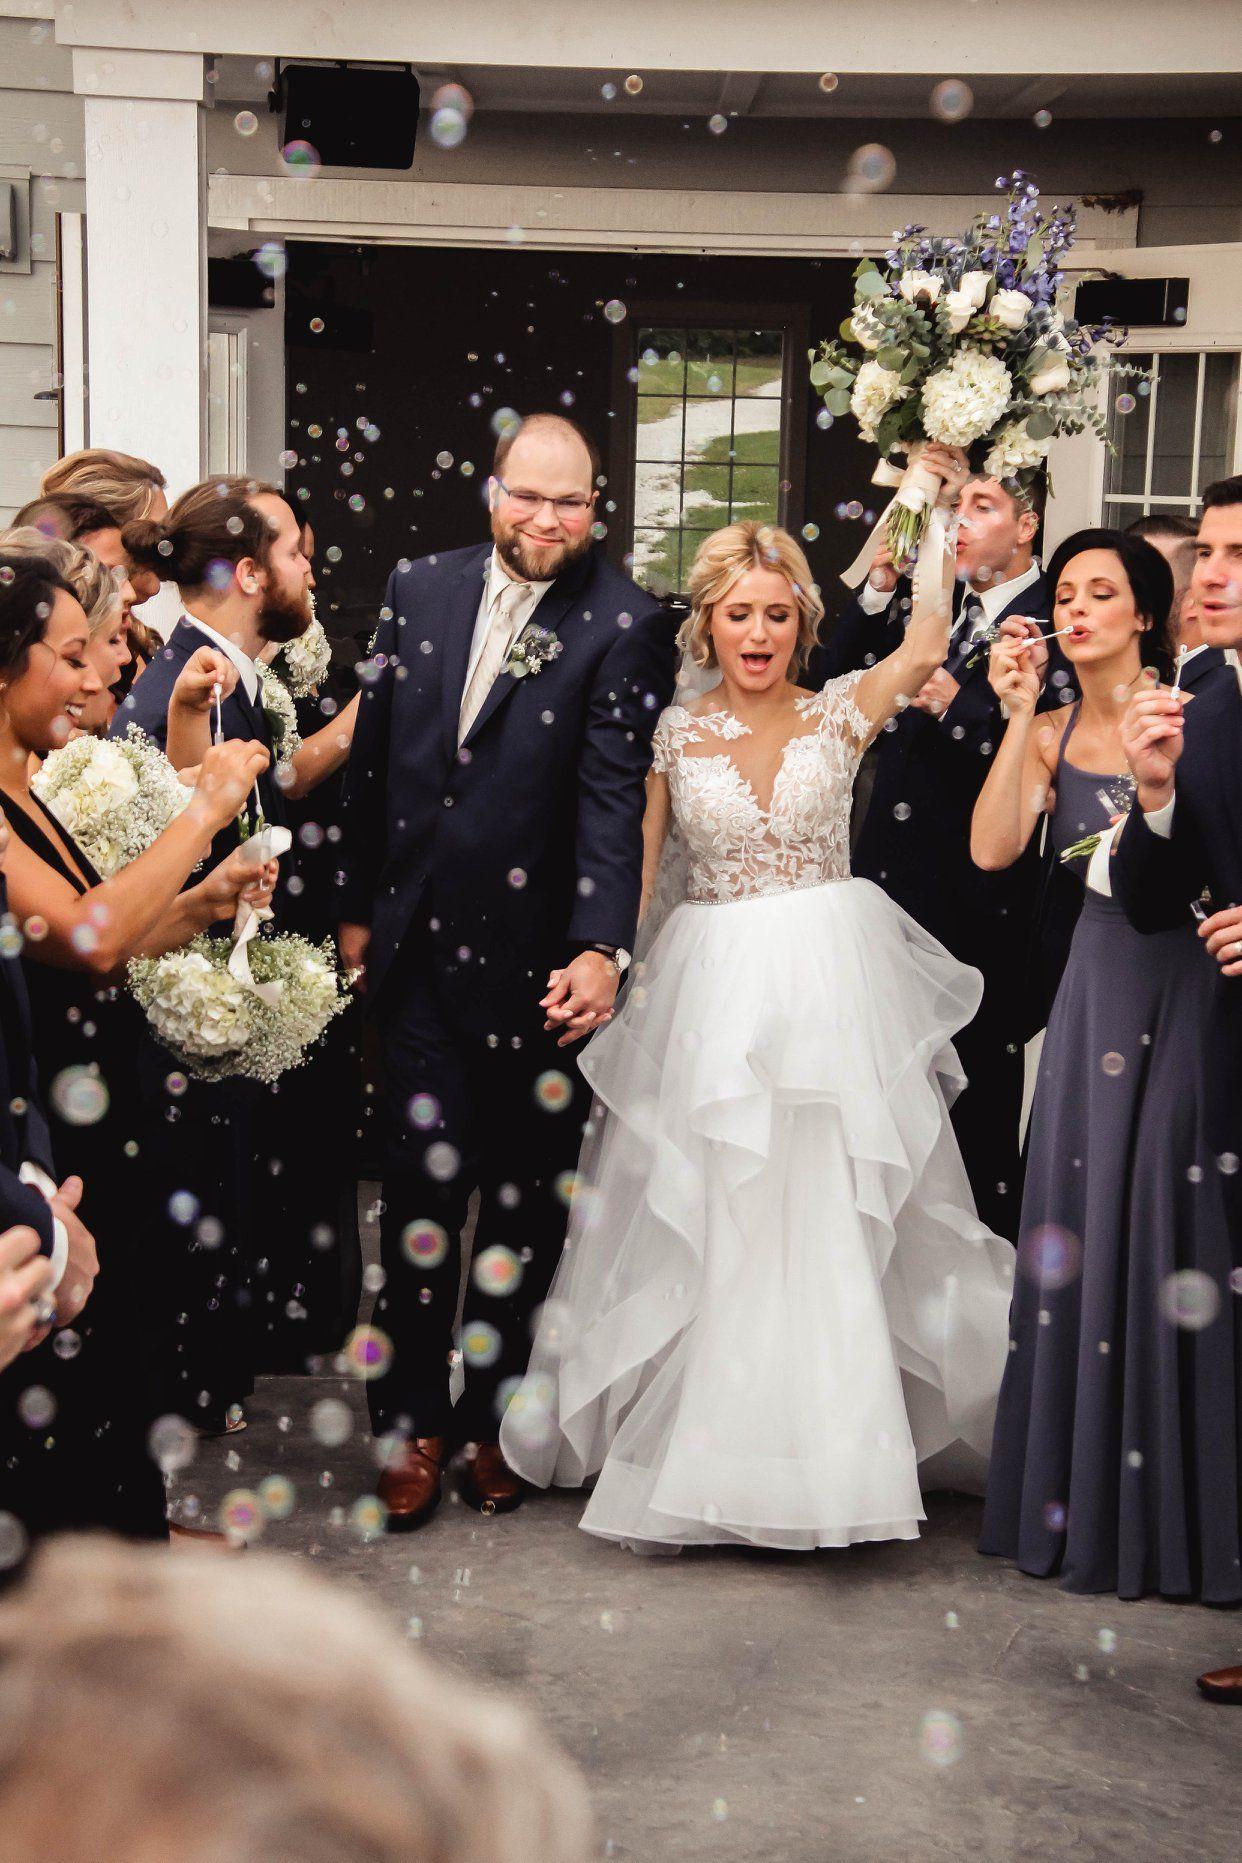 Bubble wedding send off Venue The Sycamore Winery